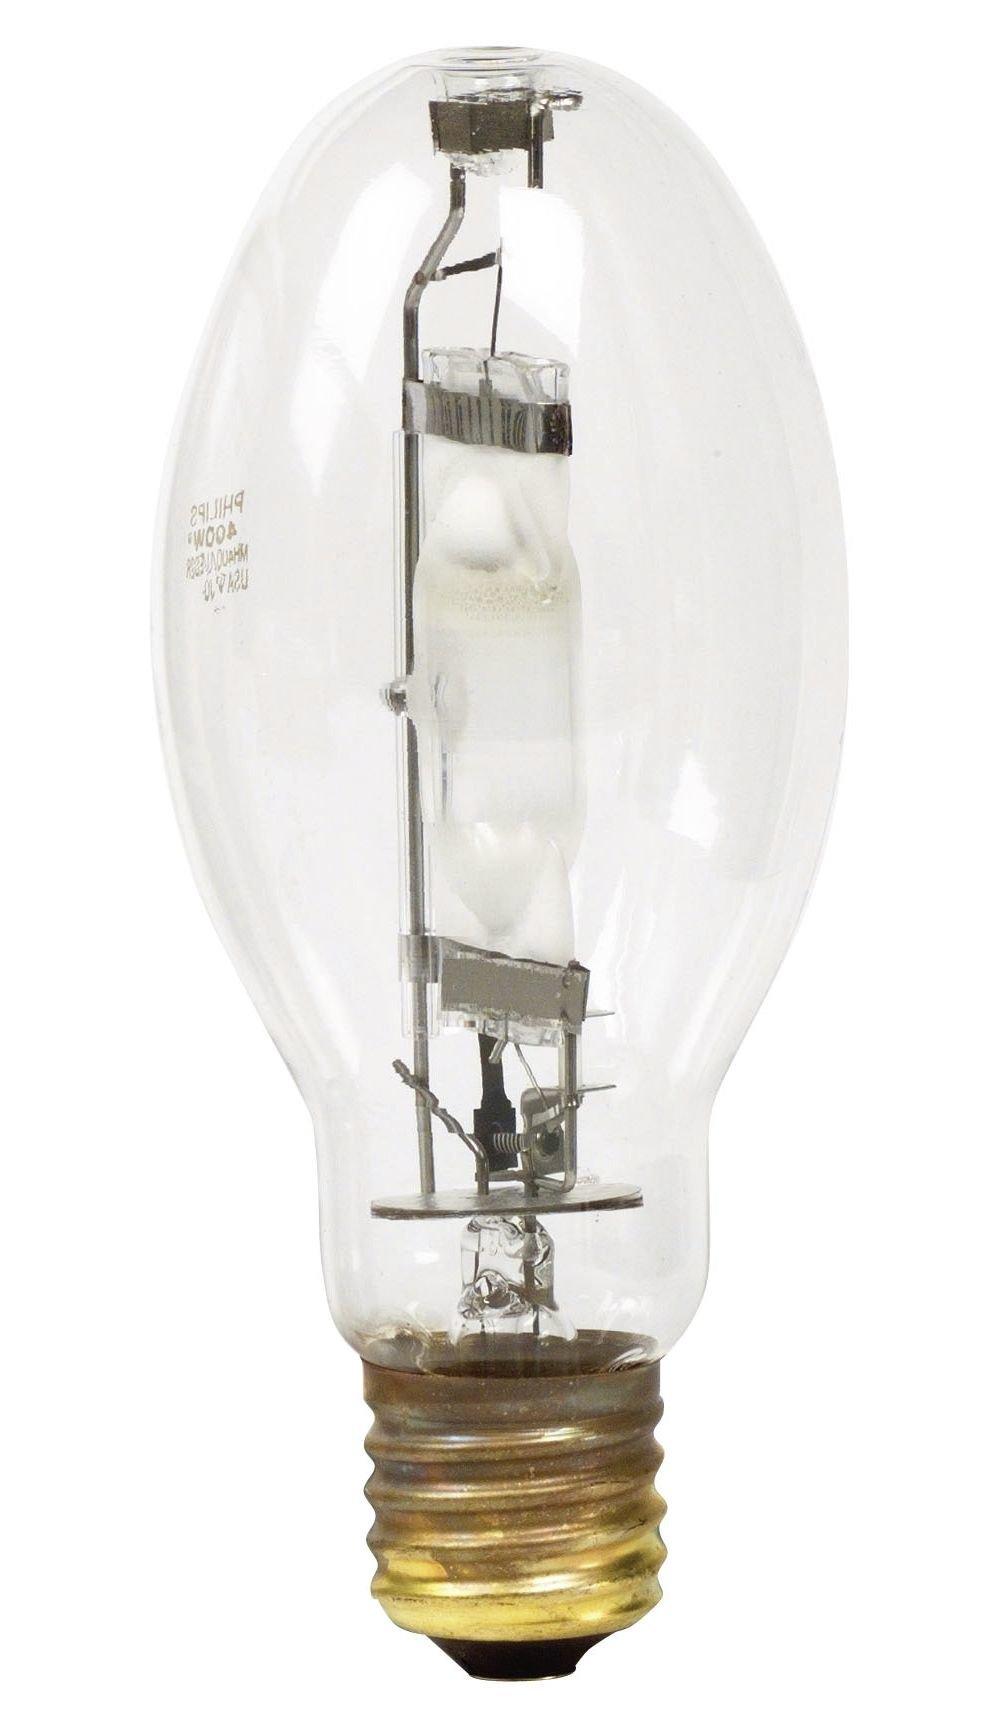 Philips 140855 High Intensity Discharge Metal Halide 175-Watt ED28 Mogul Base Light Bulb